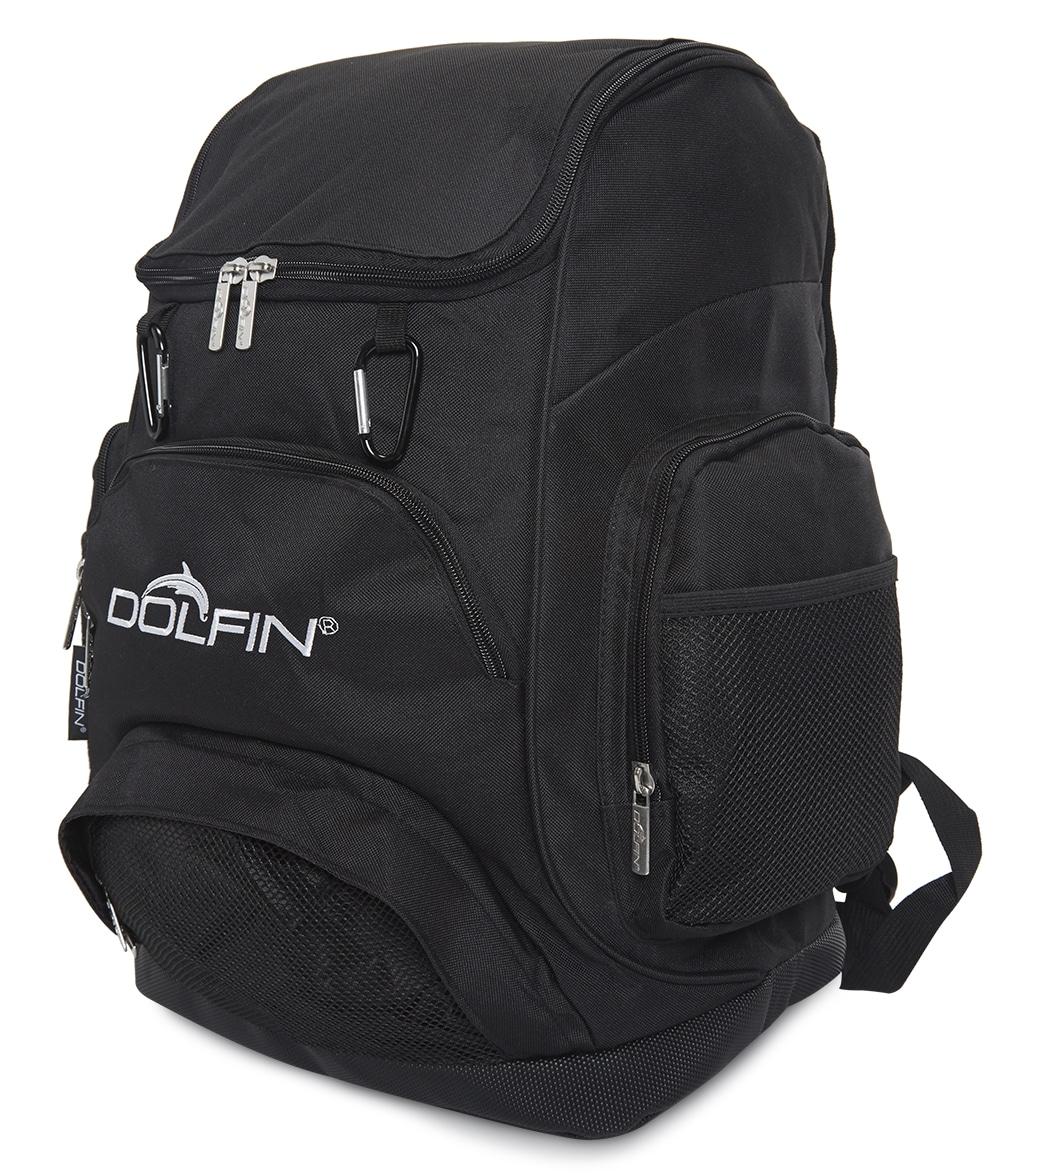 Dolfin Large Swimming Bag Backpack